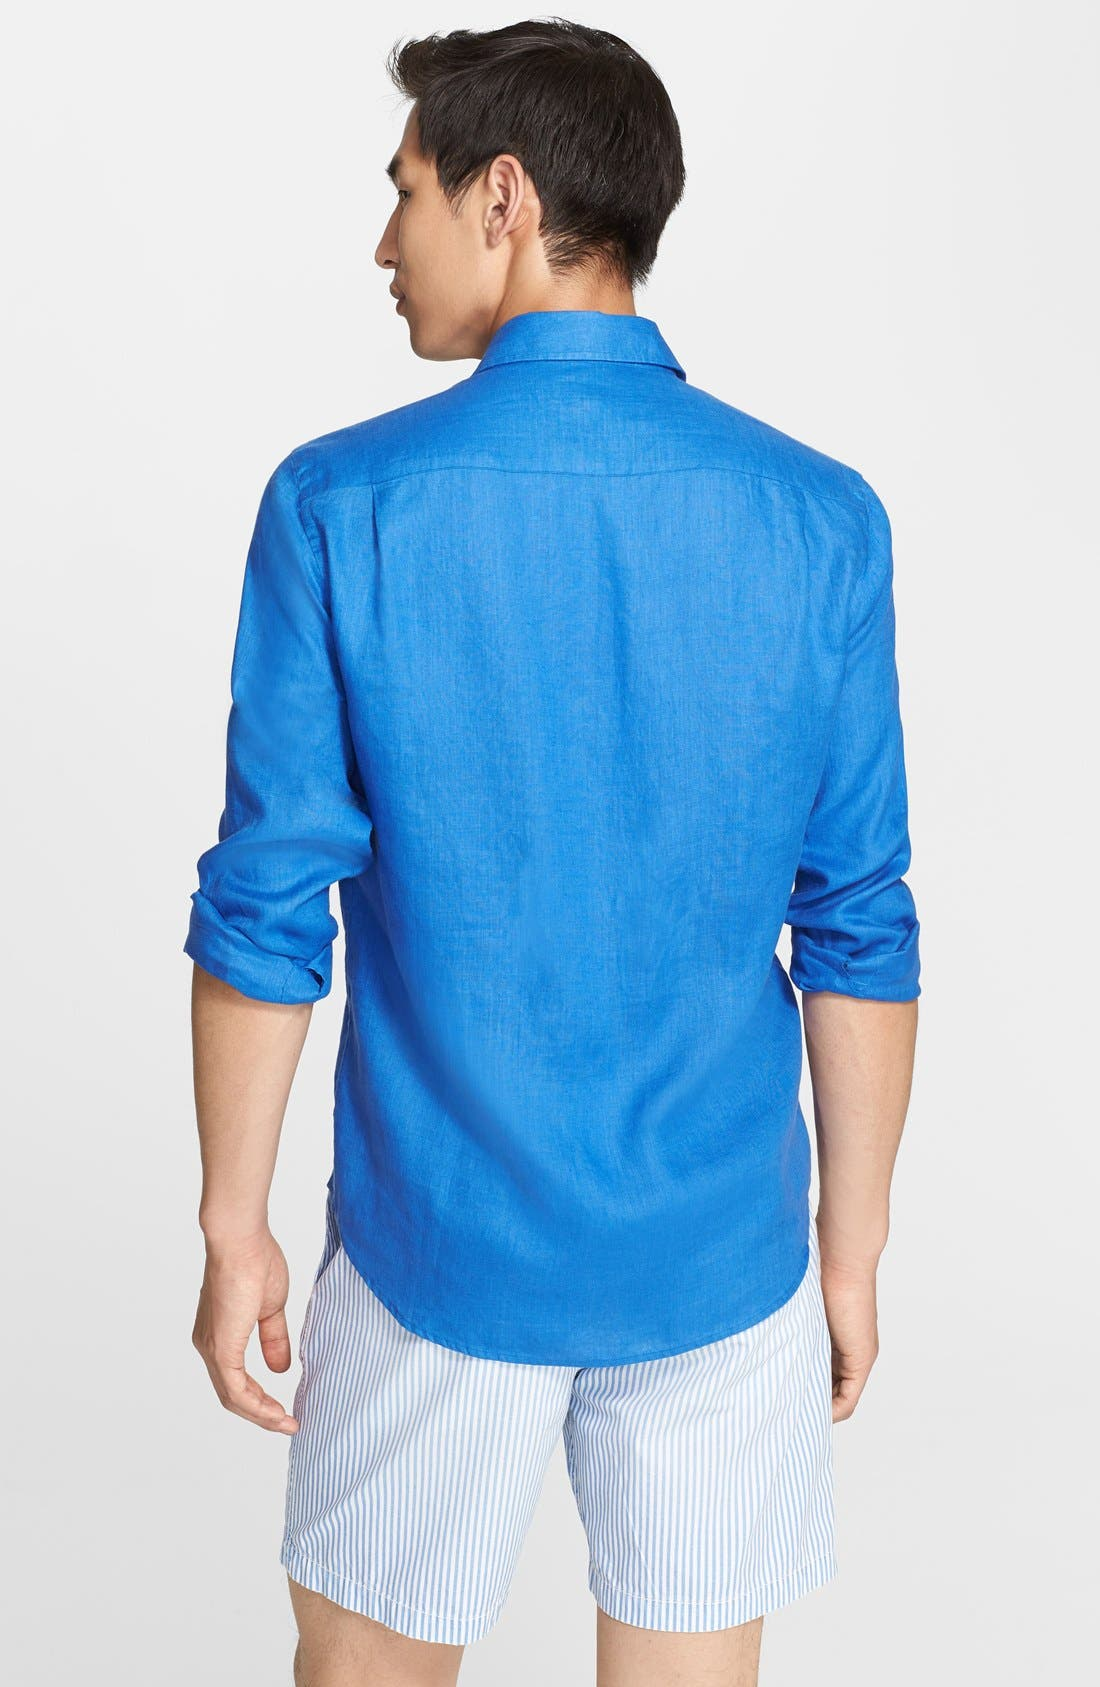 'Caroubier' Linen Shirt,                             Alternate thumbnail 25, color,